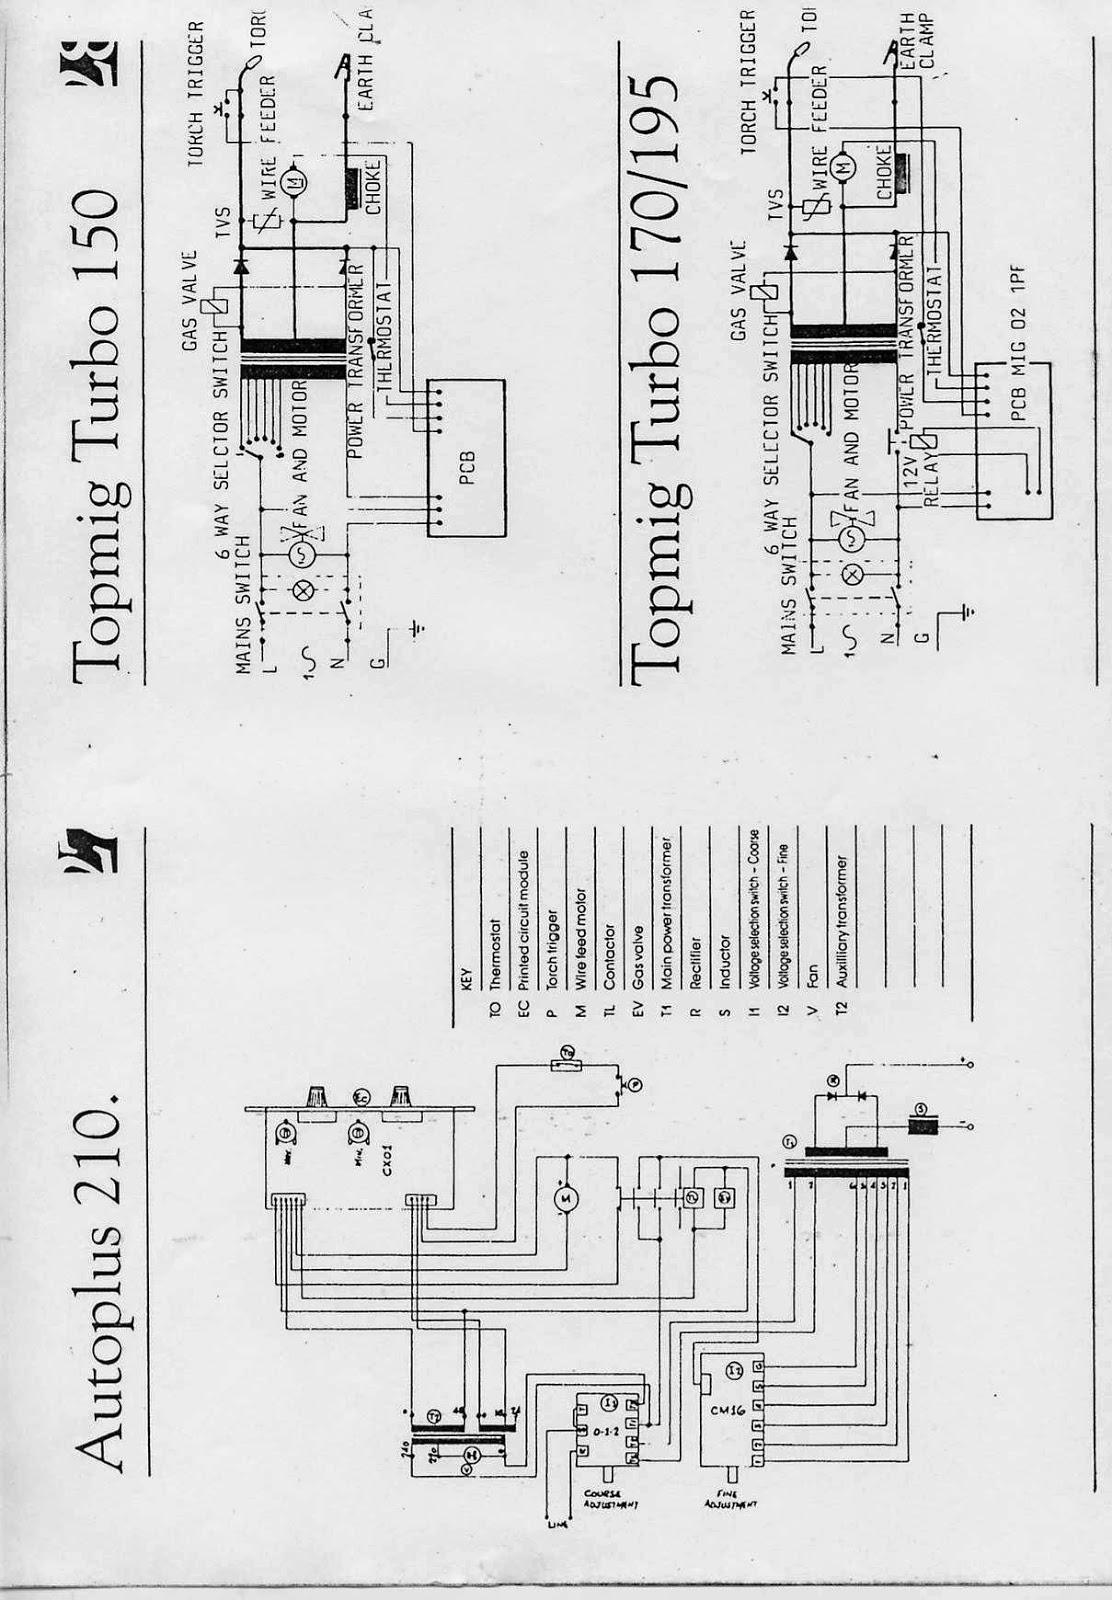 encyklopedia spawania schemat spawarki mig autoplas 130 150. Black Bedroom Furniture Sets. Home Design Ideas